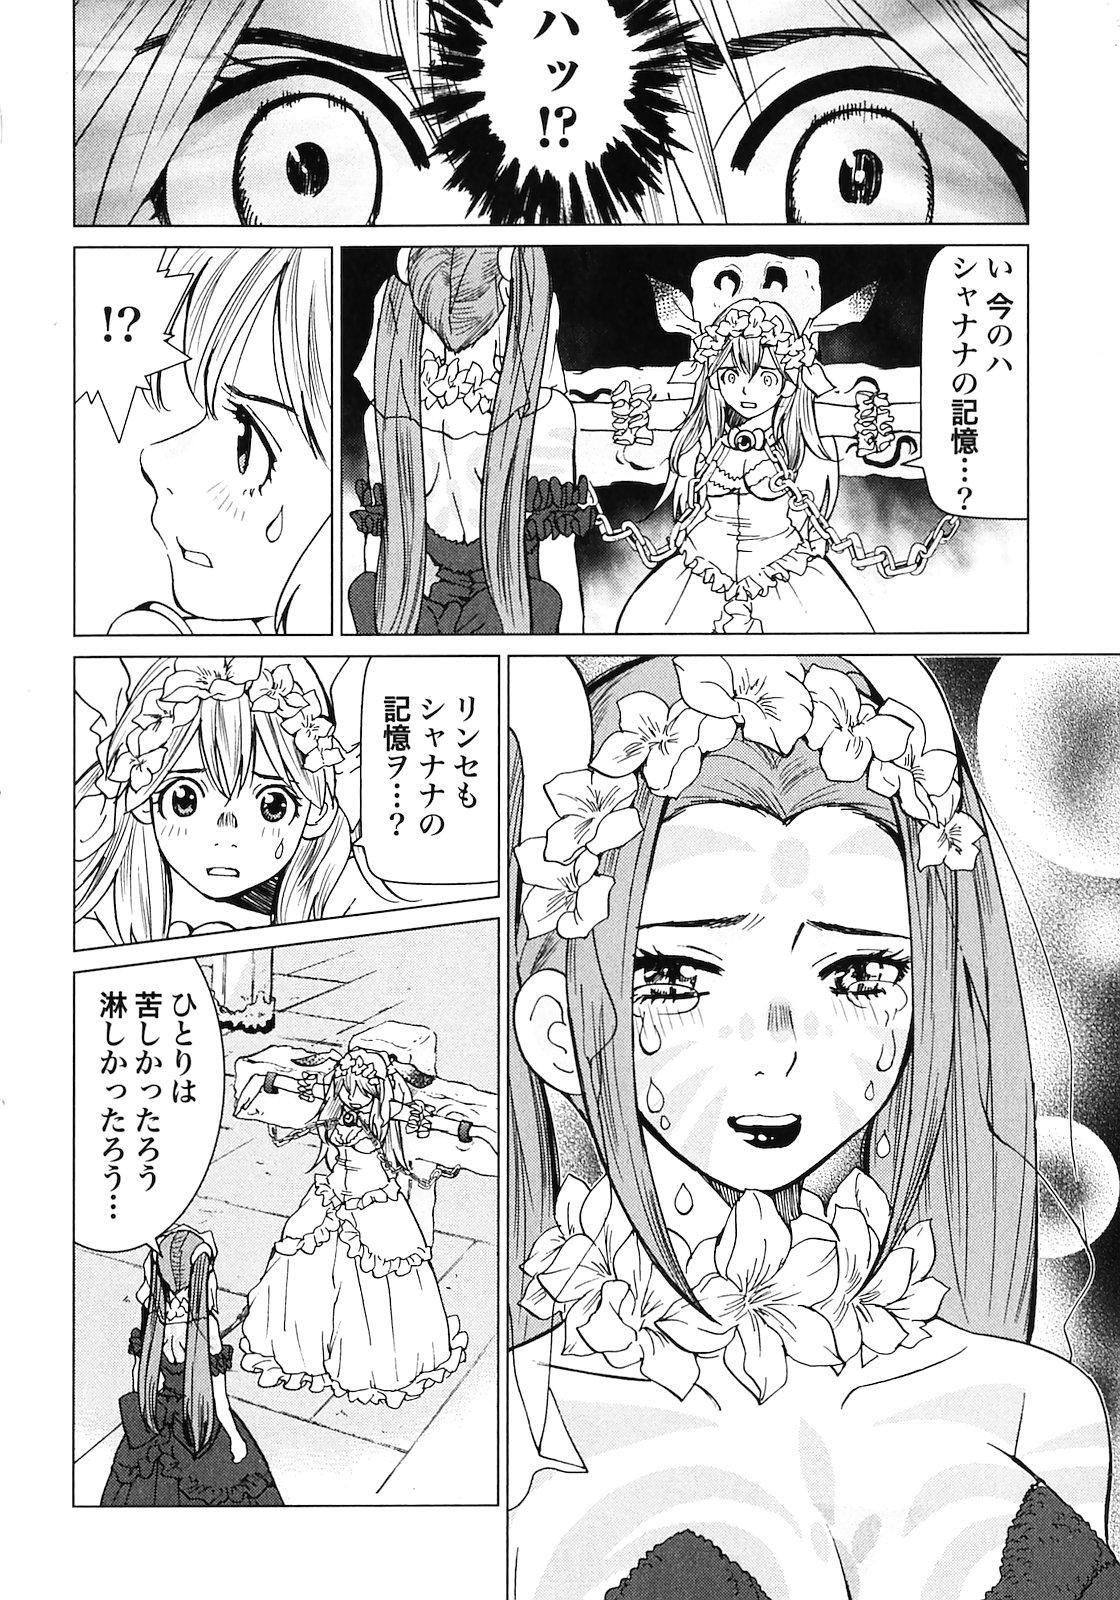 Makyo no Shanana Vol.02 133